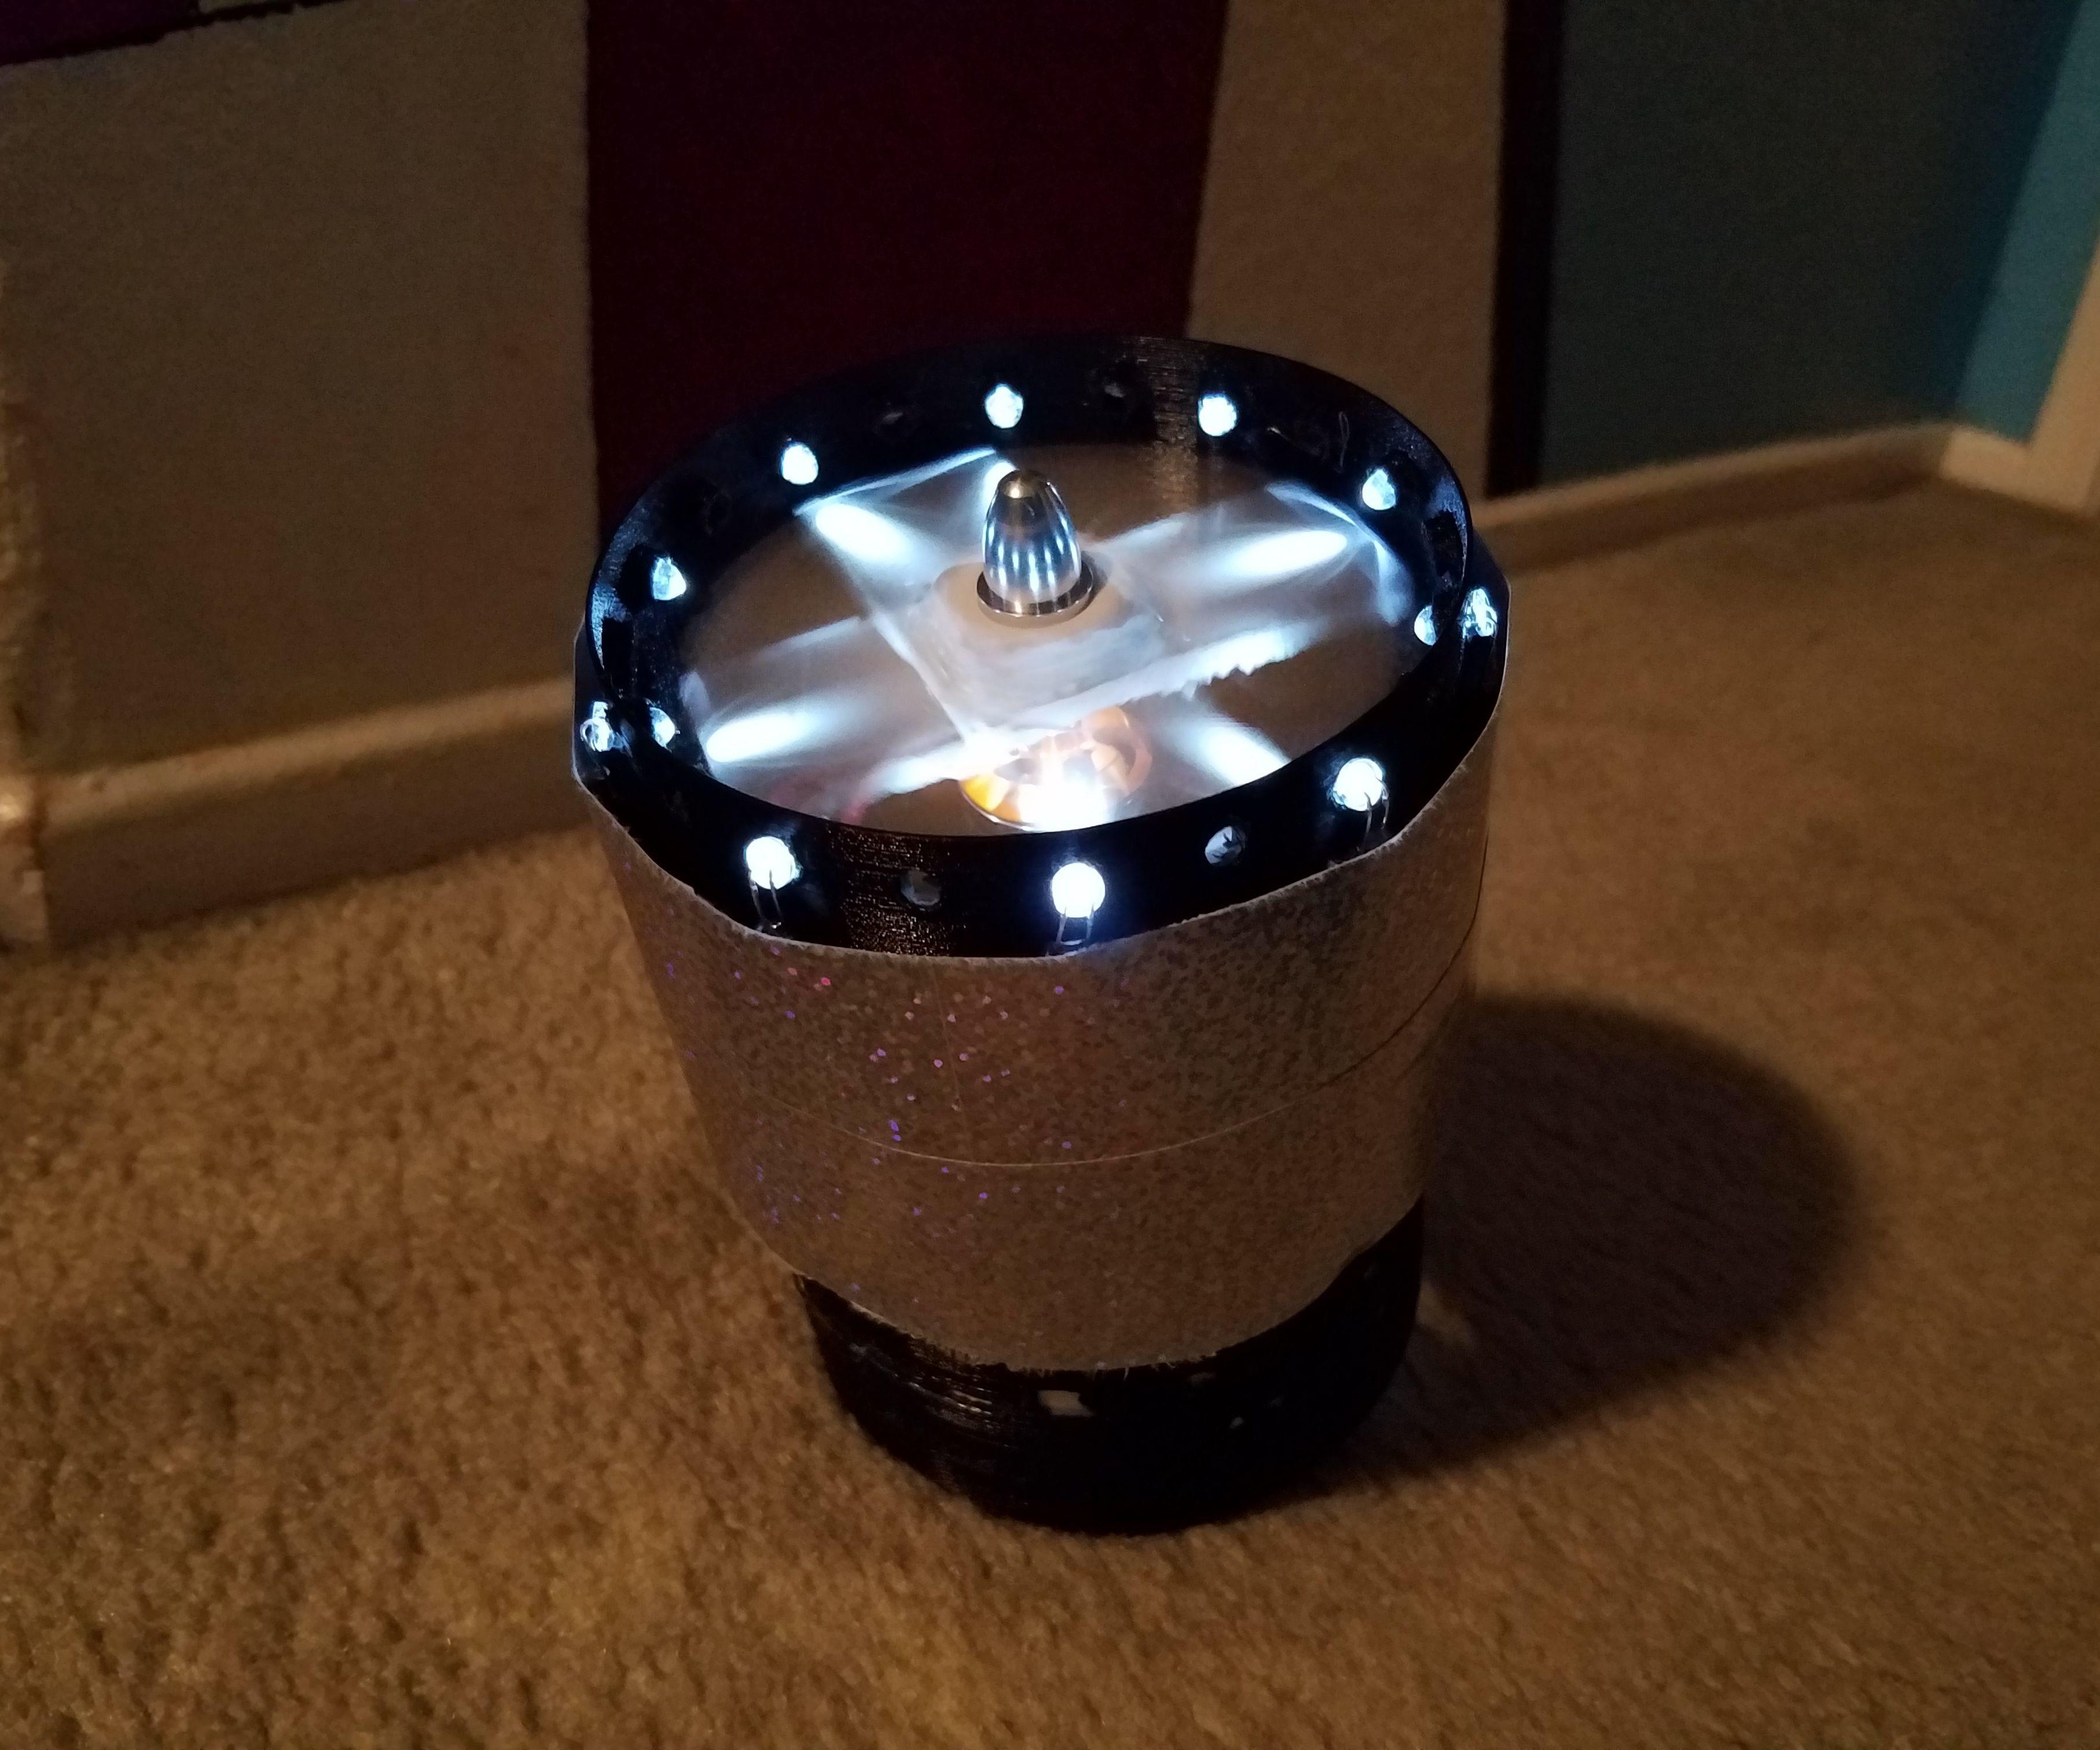 BWOOM Mask Reimagined + Arduino